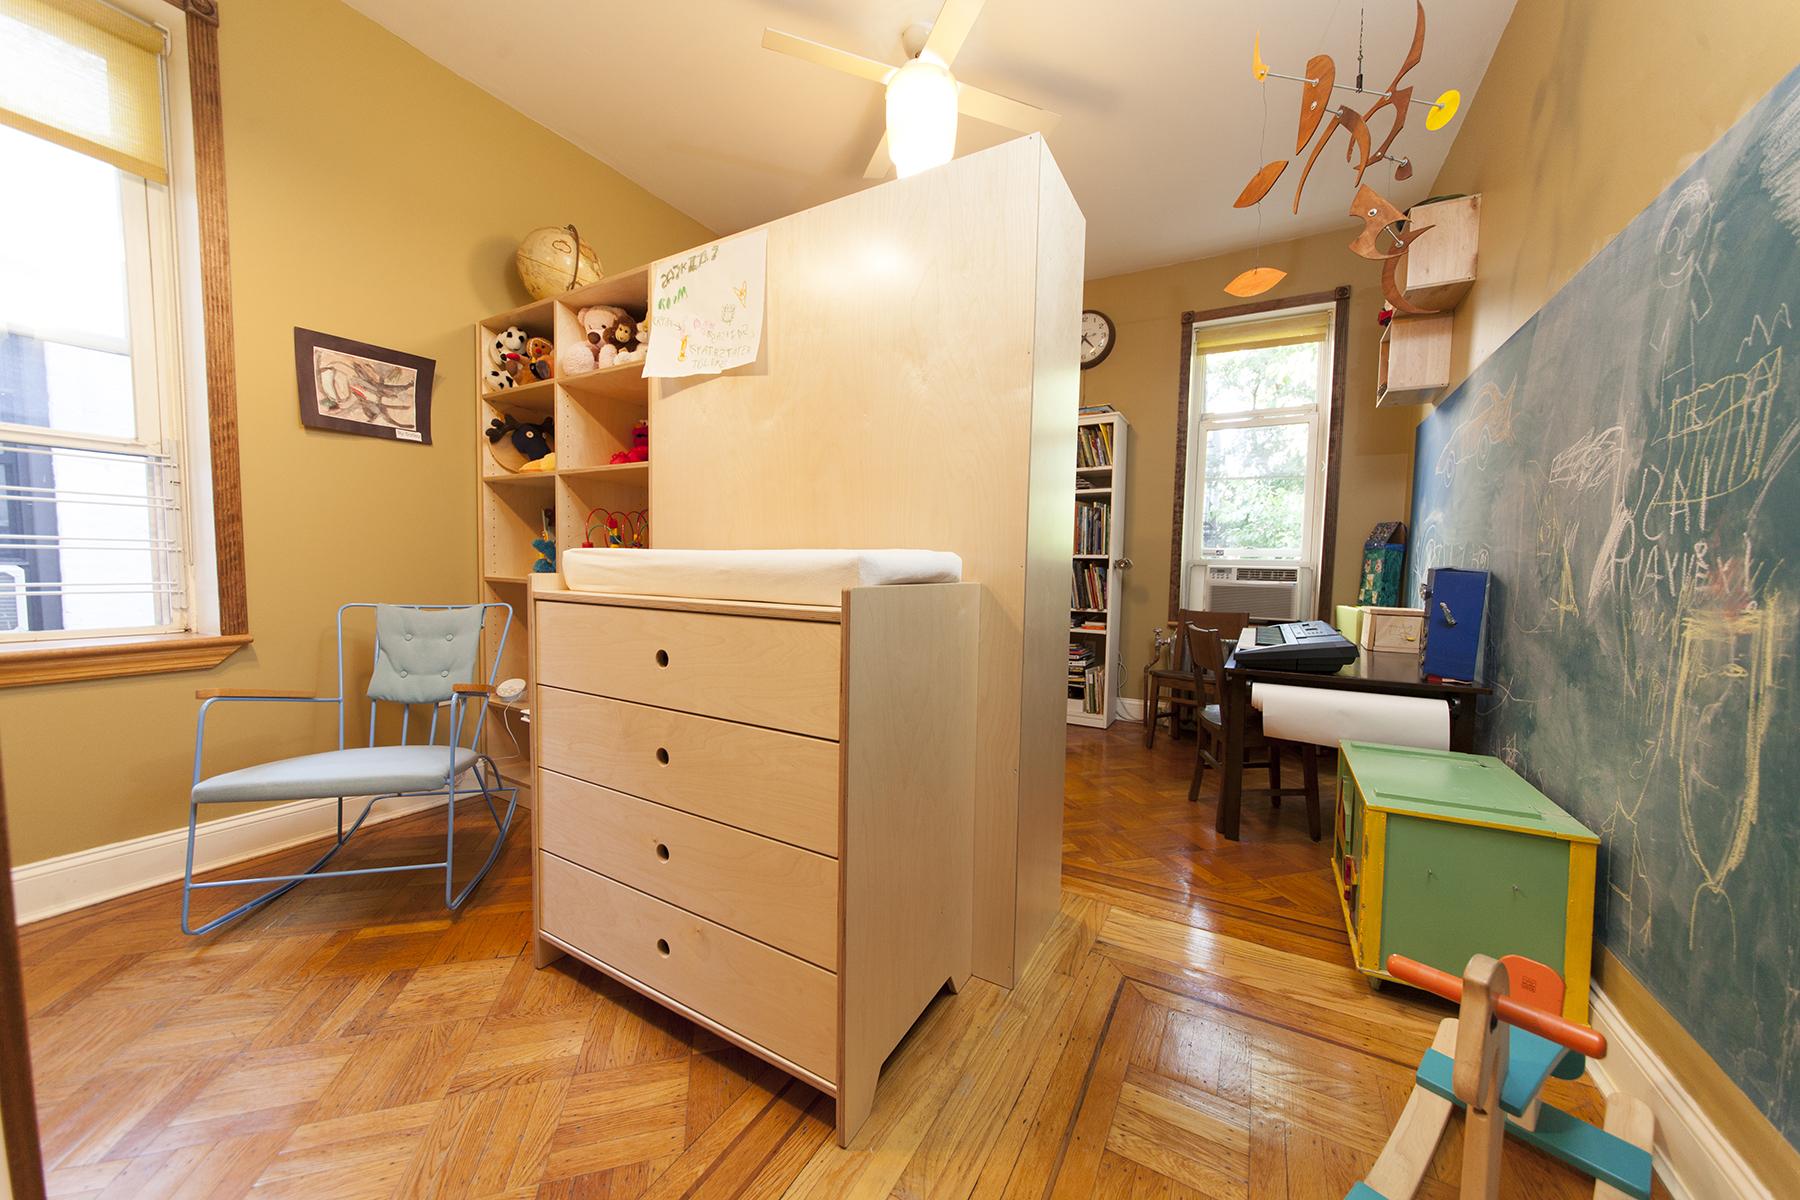 casa kids-workspace-kids furniture